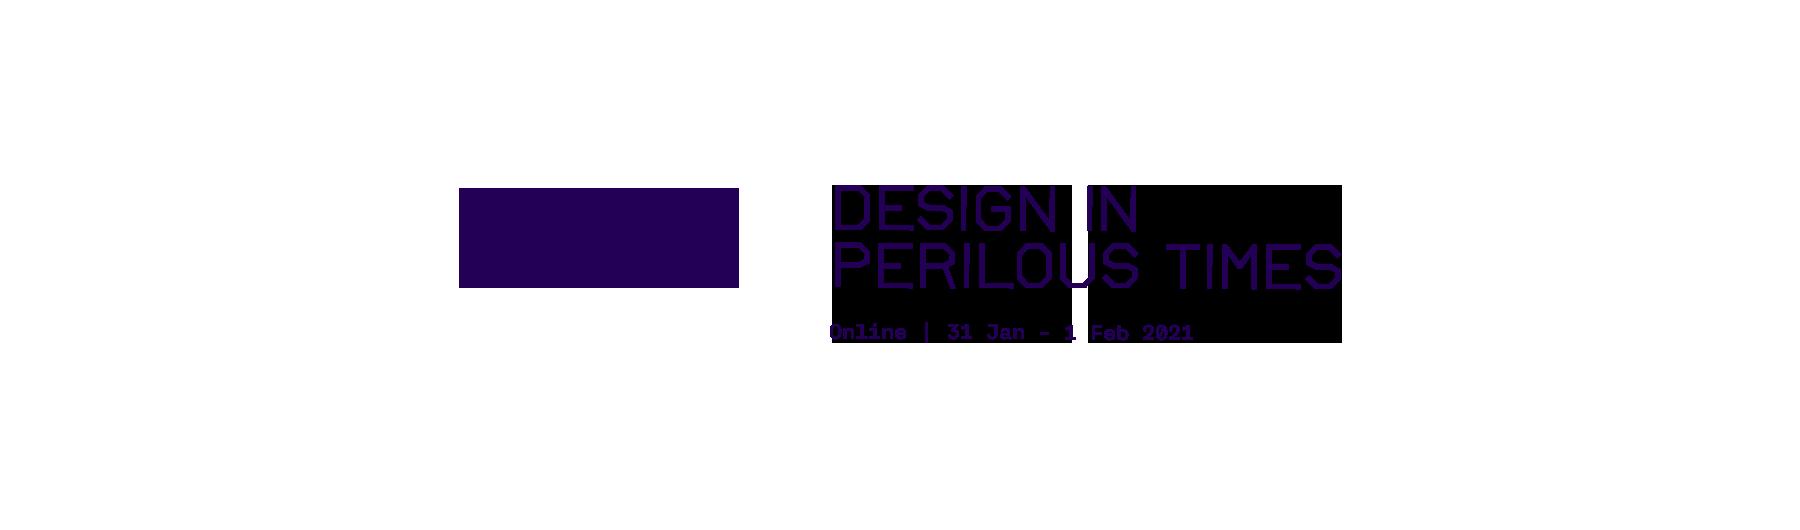 Interaction Design Education Summit 2021